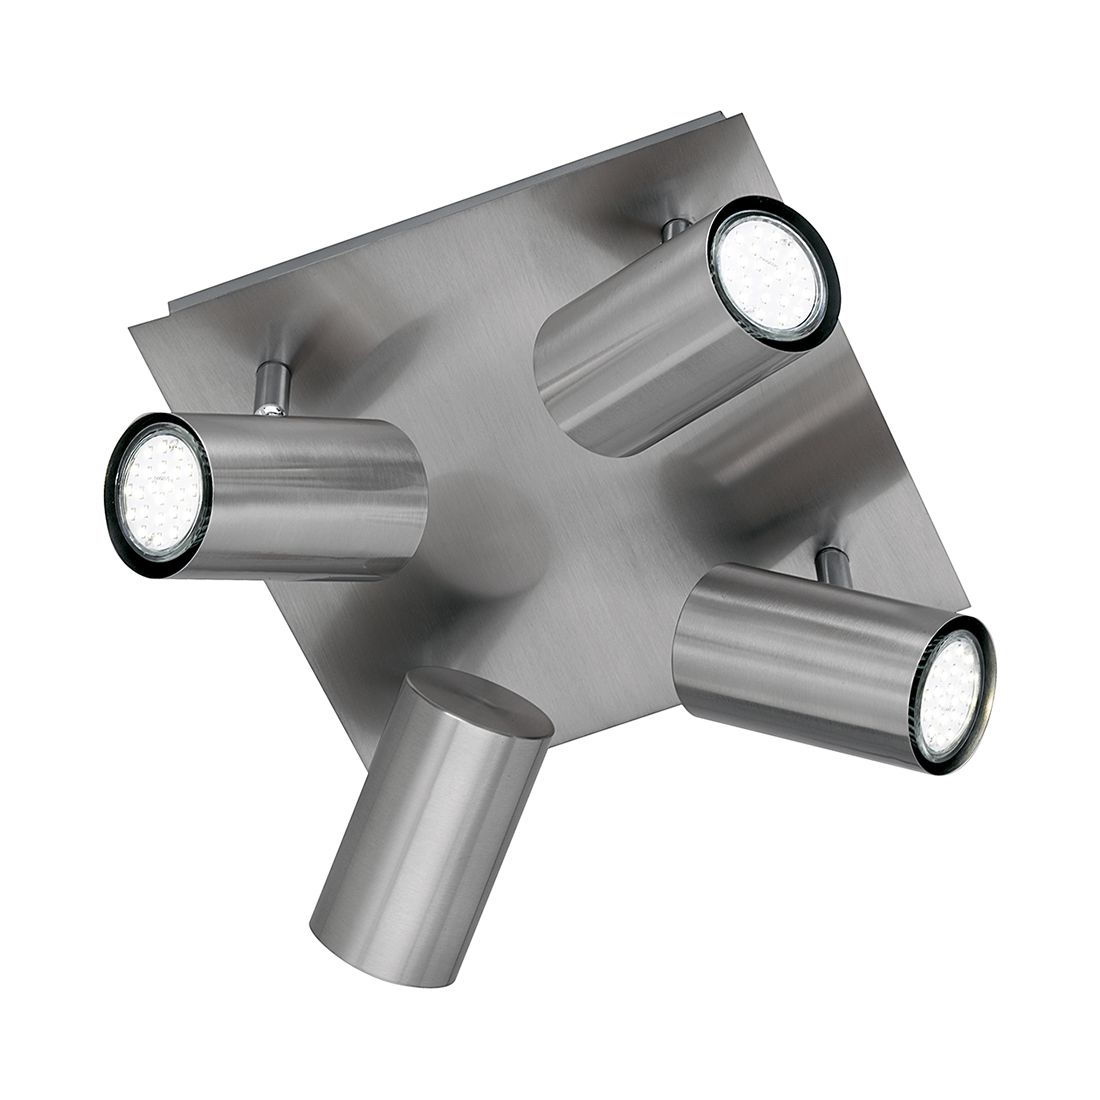 EEK A++, Rondell – Nickel – 4 flammig, Trio kaufen